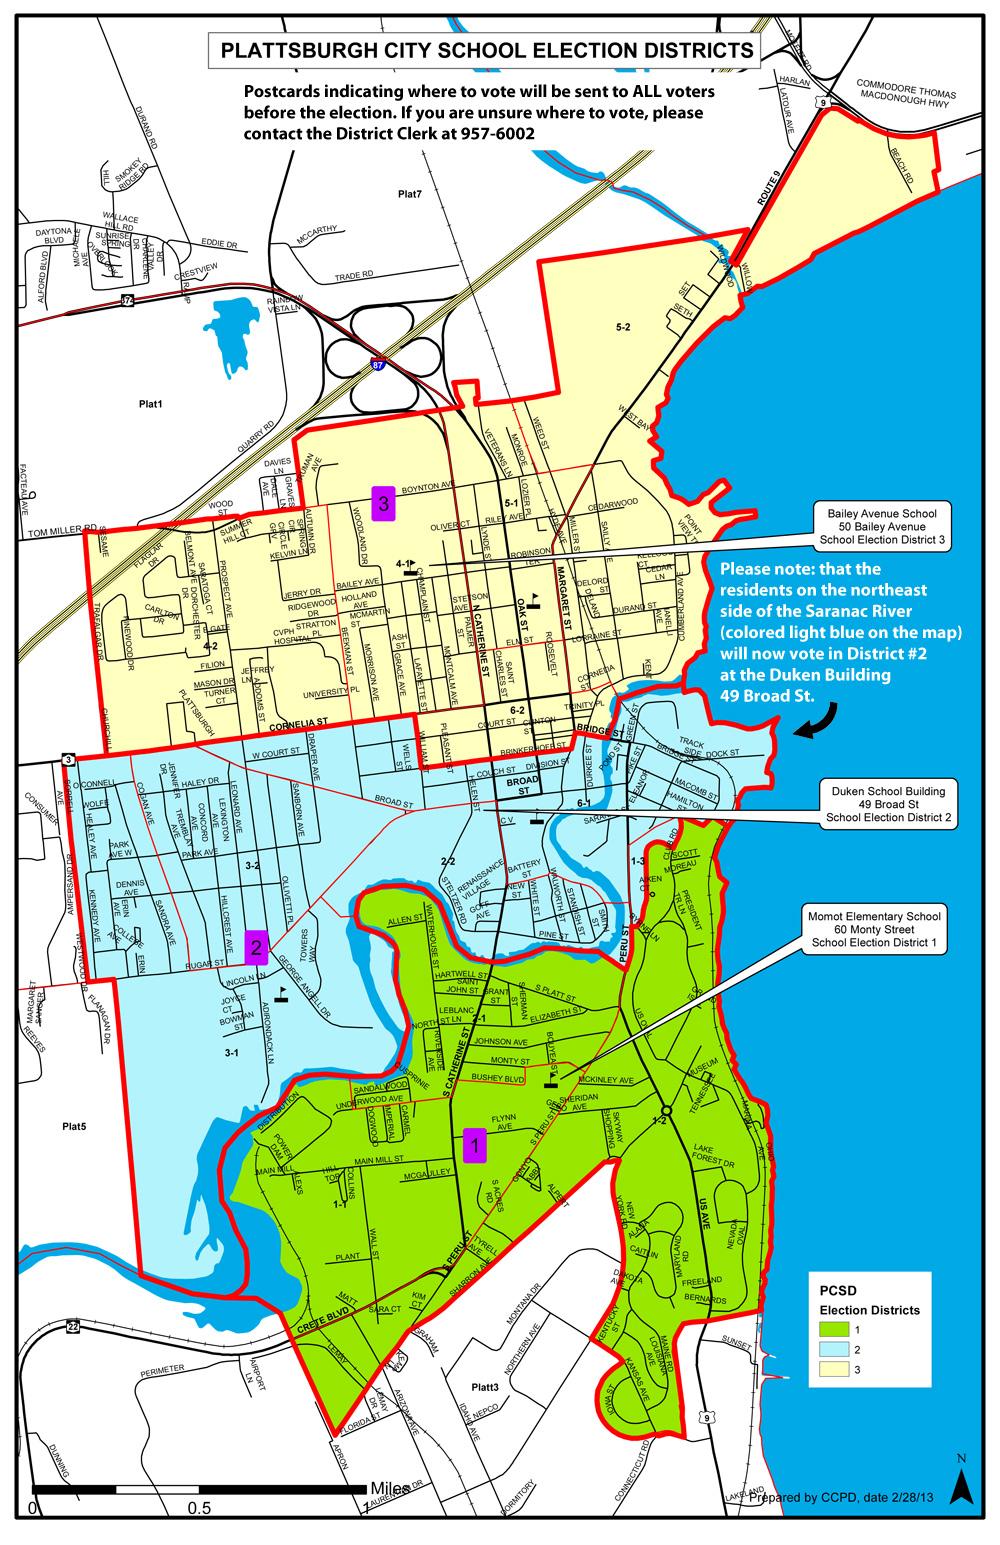 PCSD Election-District-Map-2013